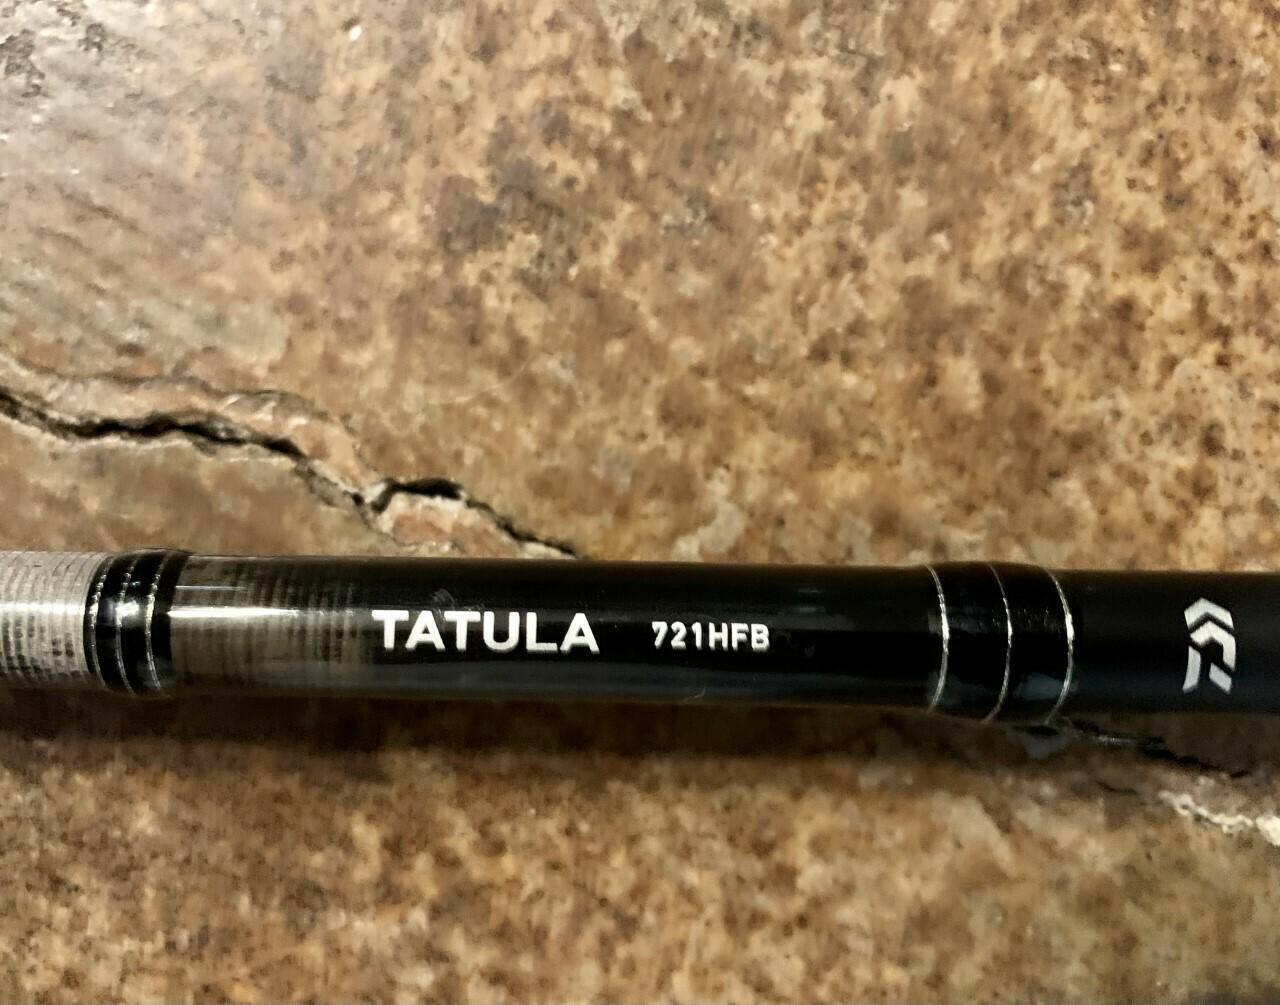 01-Pre-owned Daiwa Tatula 721HFB Casting